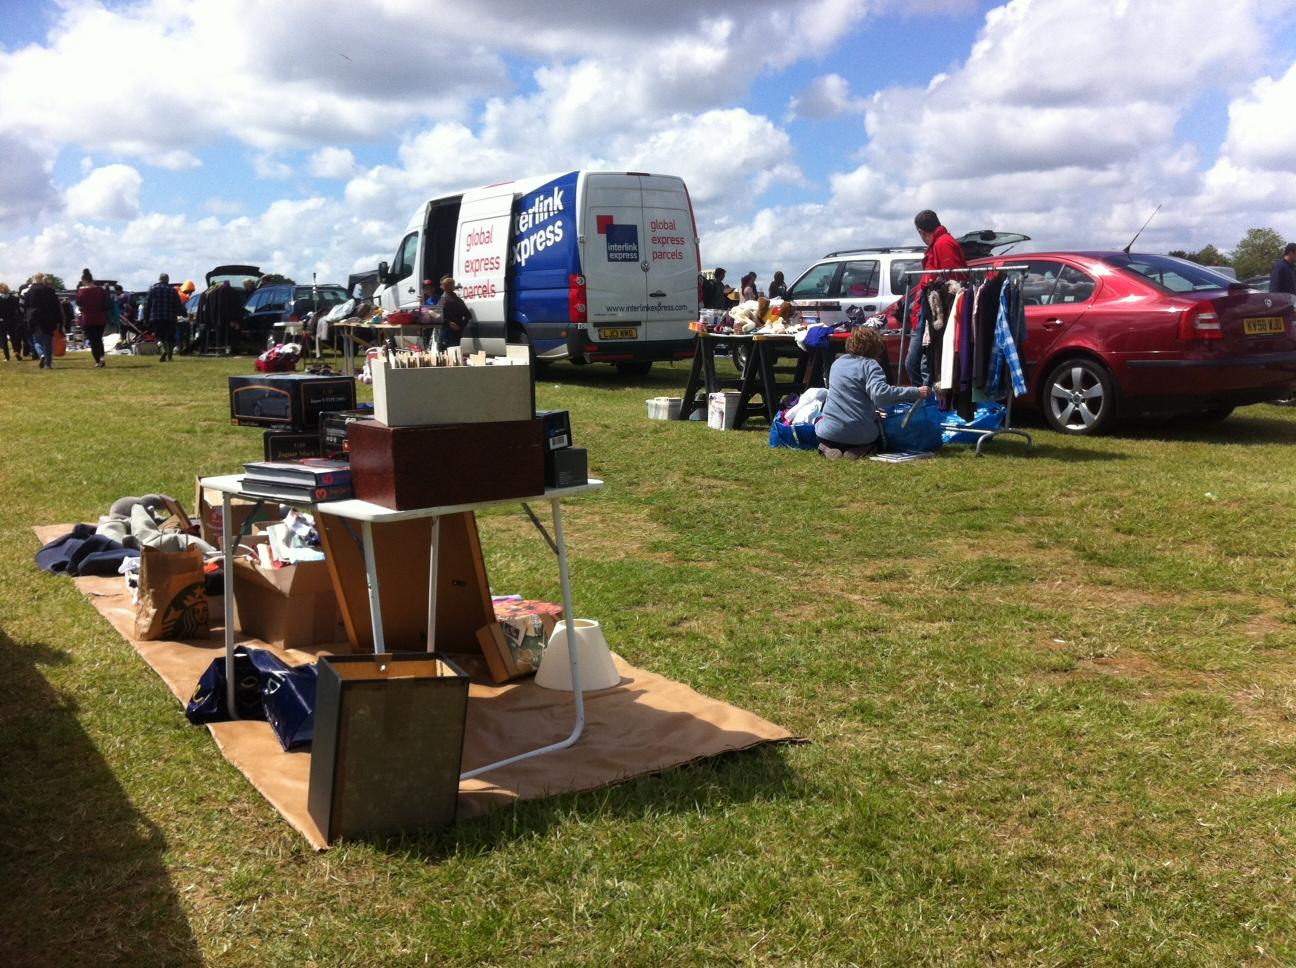 Pease Pottage Car Boot Sale